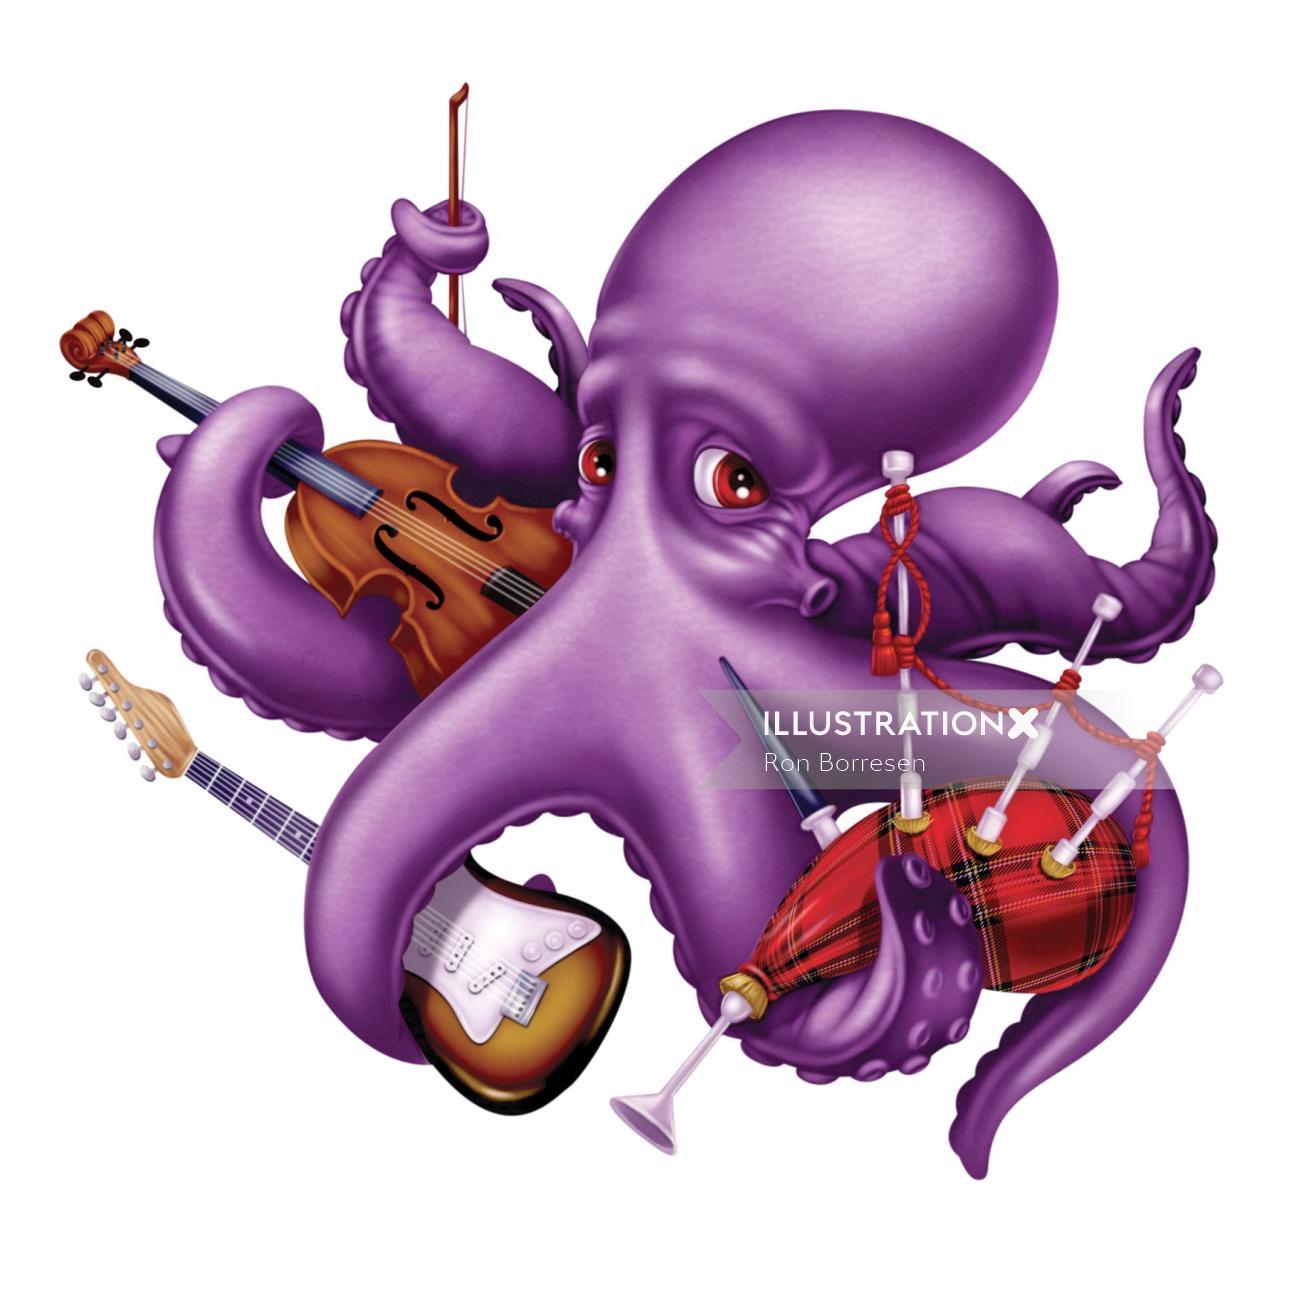 Cartoon octopus playing music illustration by Ron Borresen